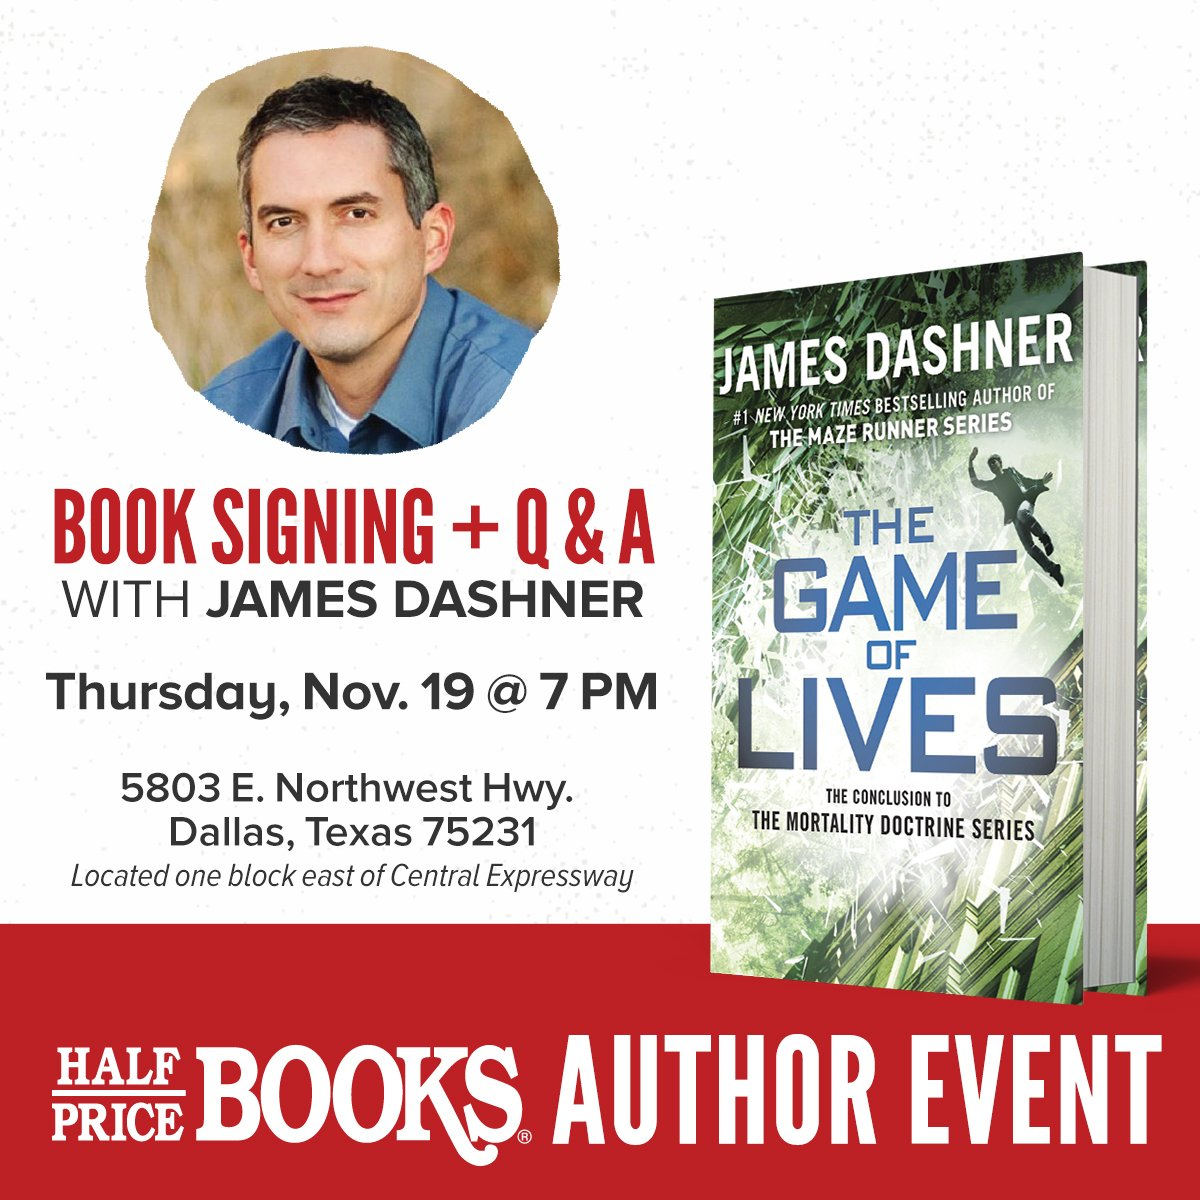 Next week at the HPB Flagship in Dallas! @jamesdashner! https://t.co/hDxuPcZ3ch https://t.co/3kYqBTryYM